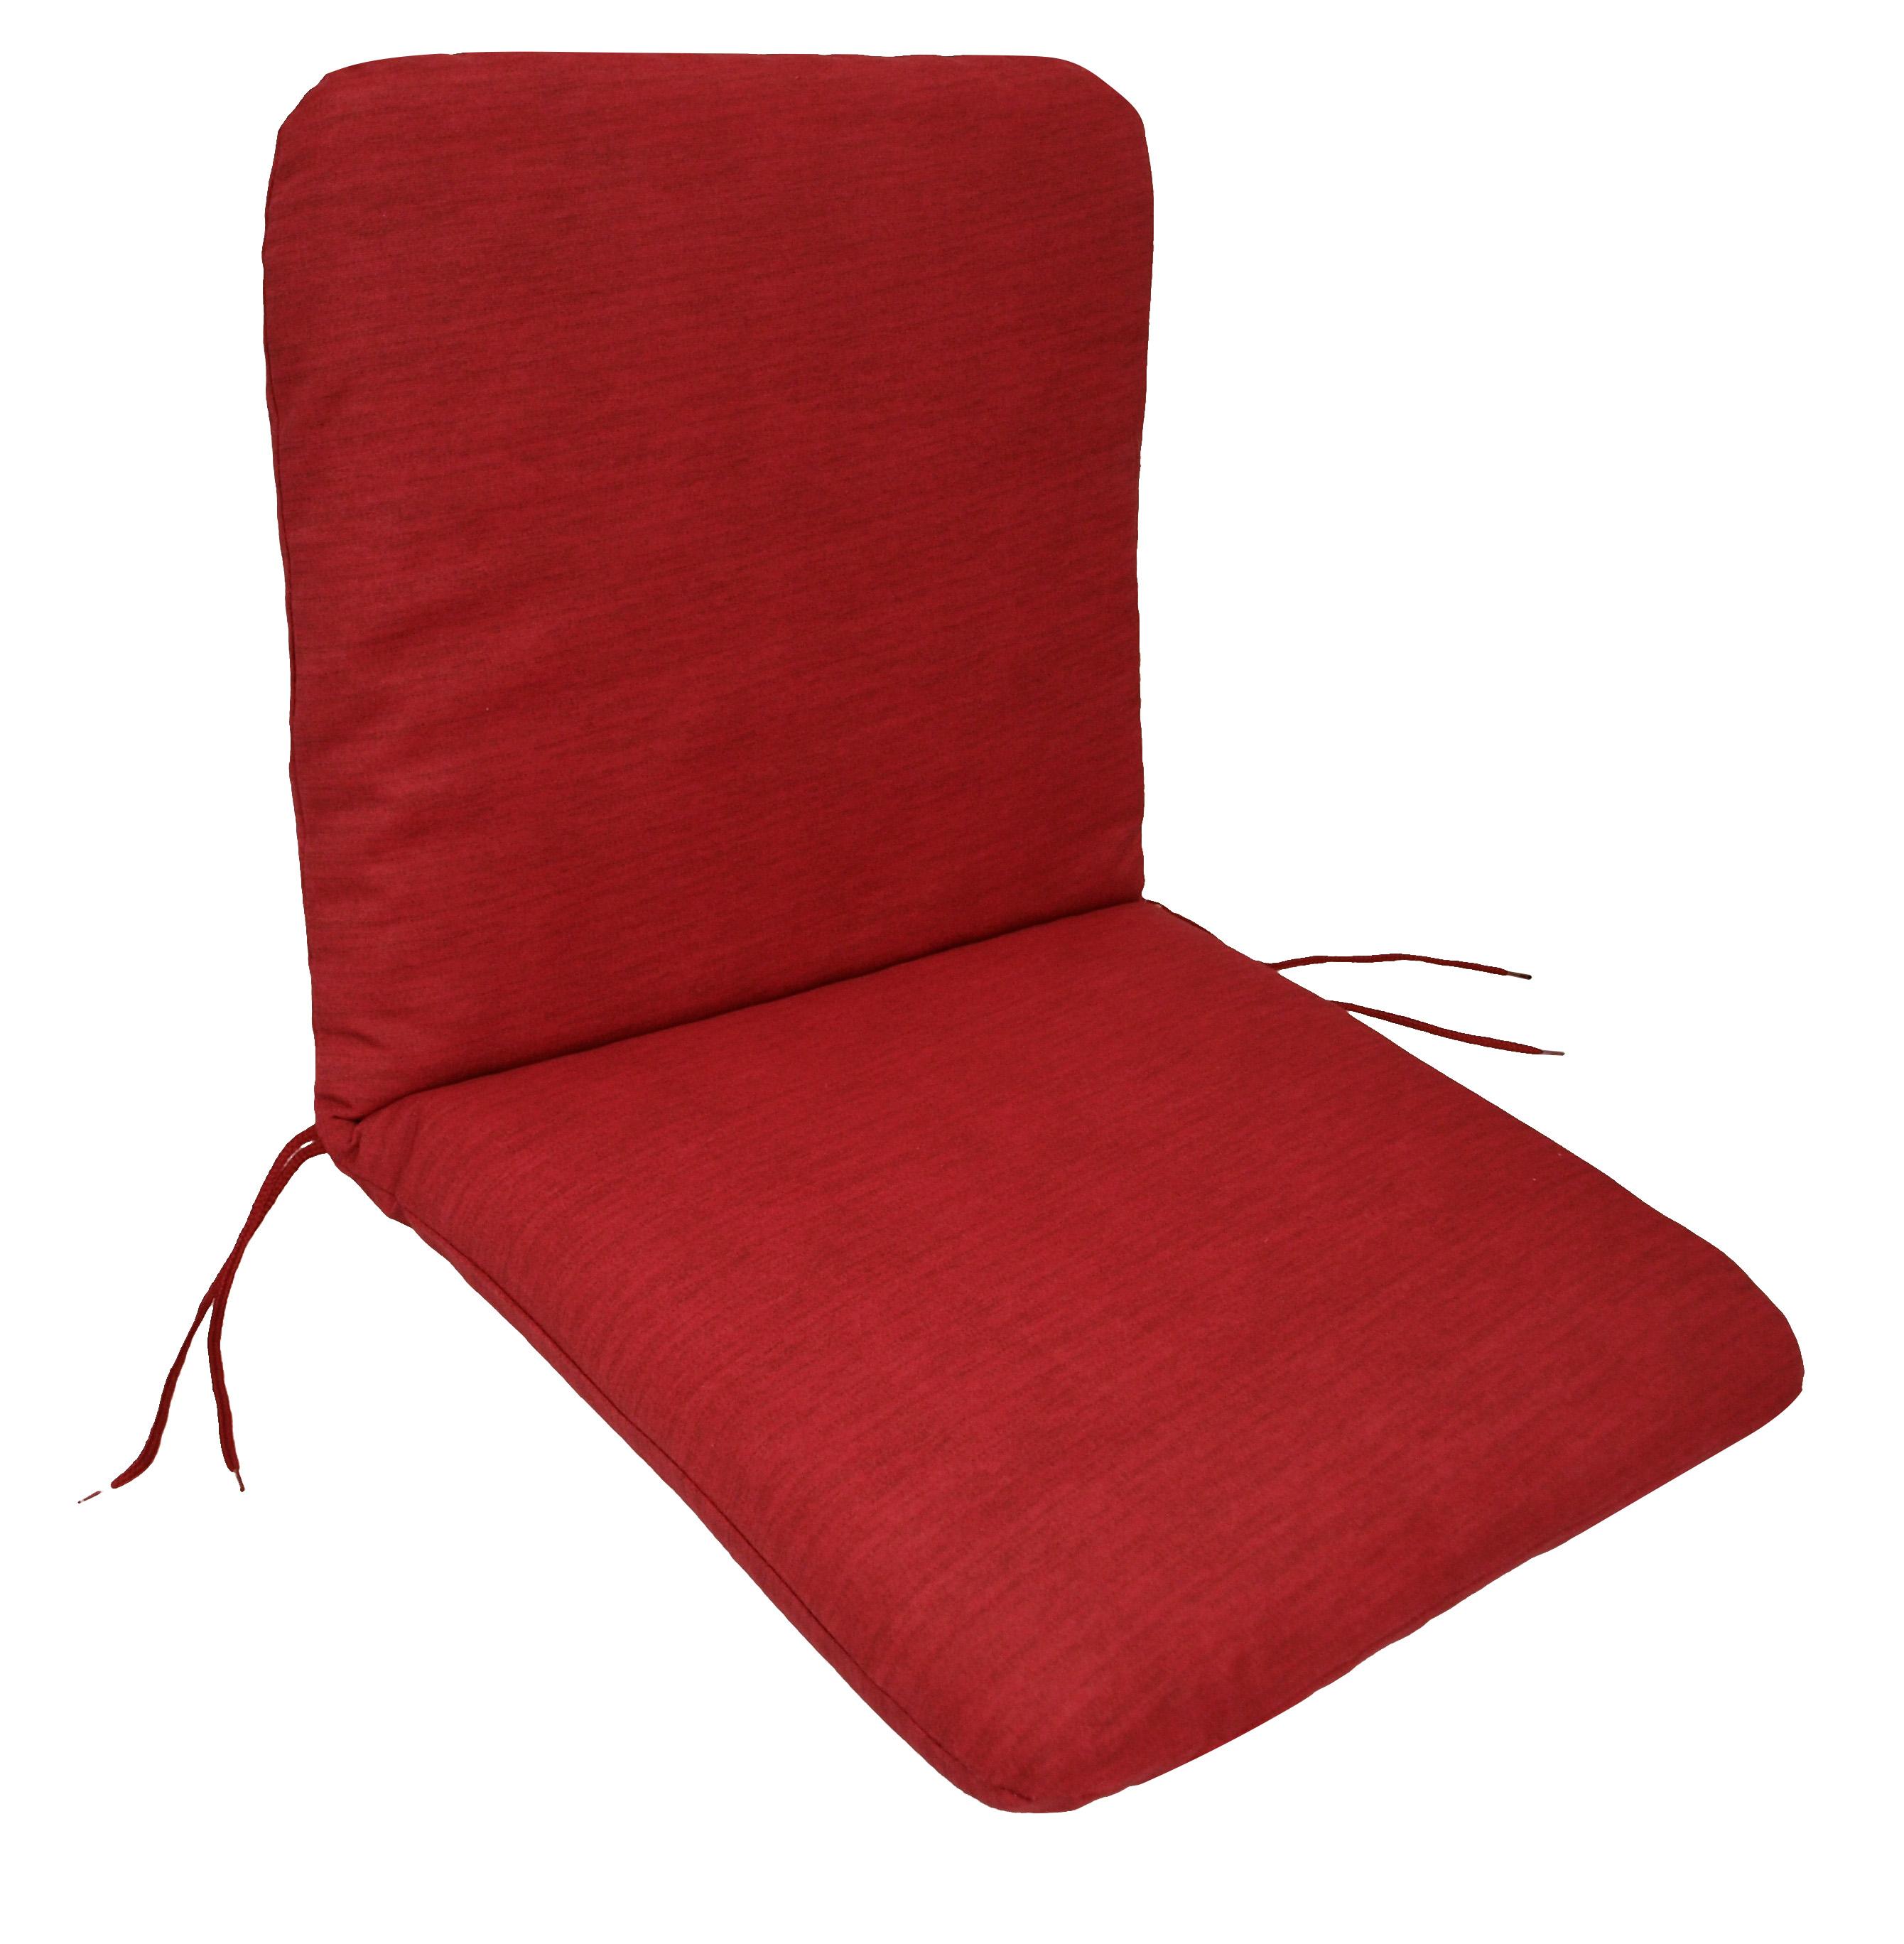 Auflage TACOMA für Sessel, rot